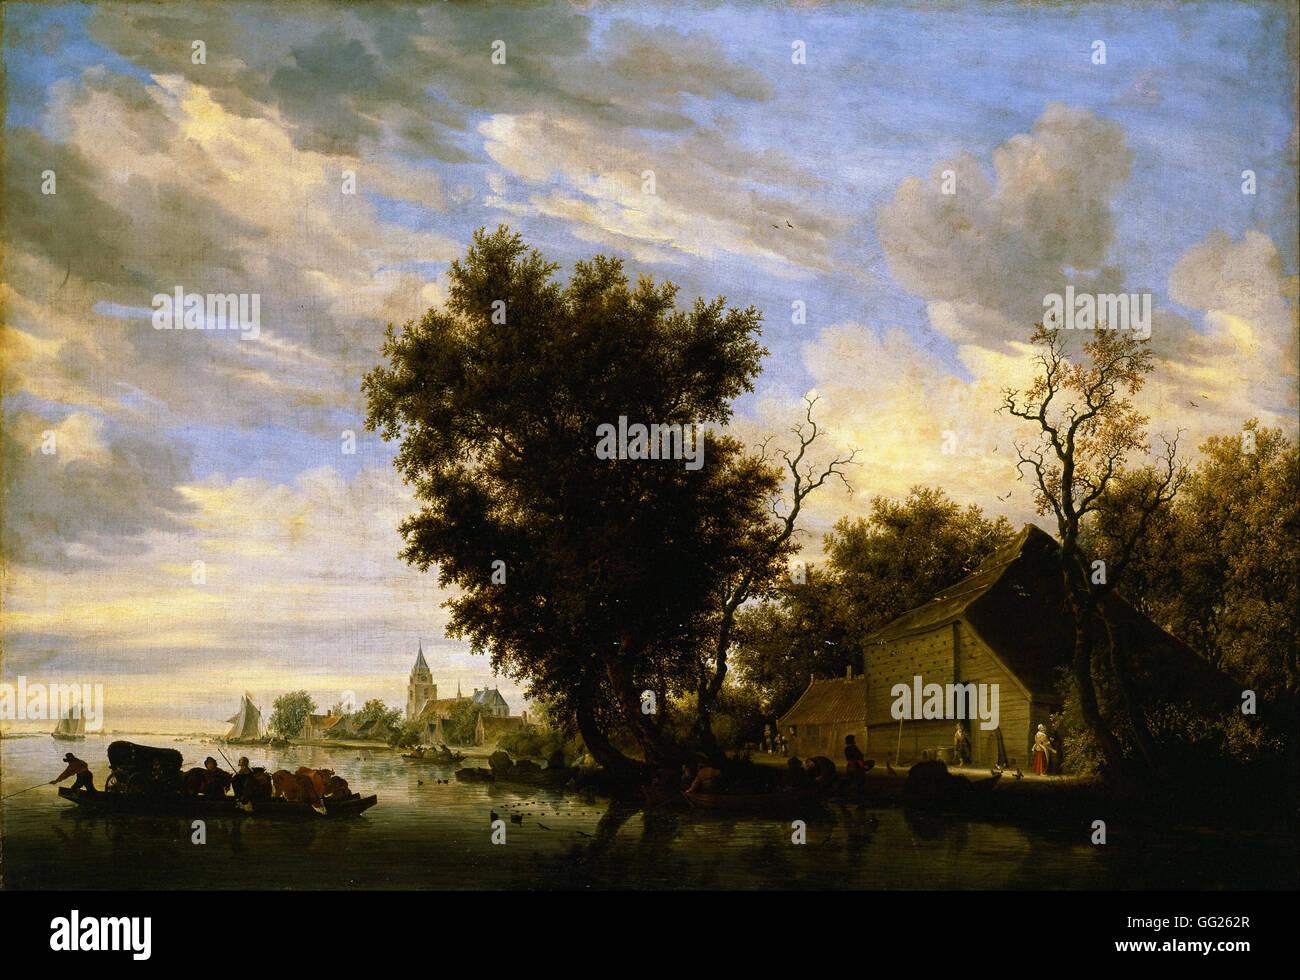 Salomon van Ruysdael - River scene with ferry boat Stock Photo